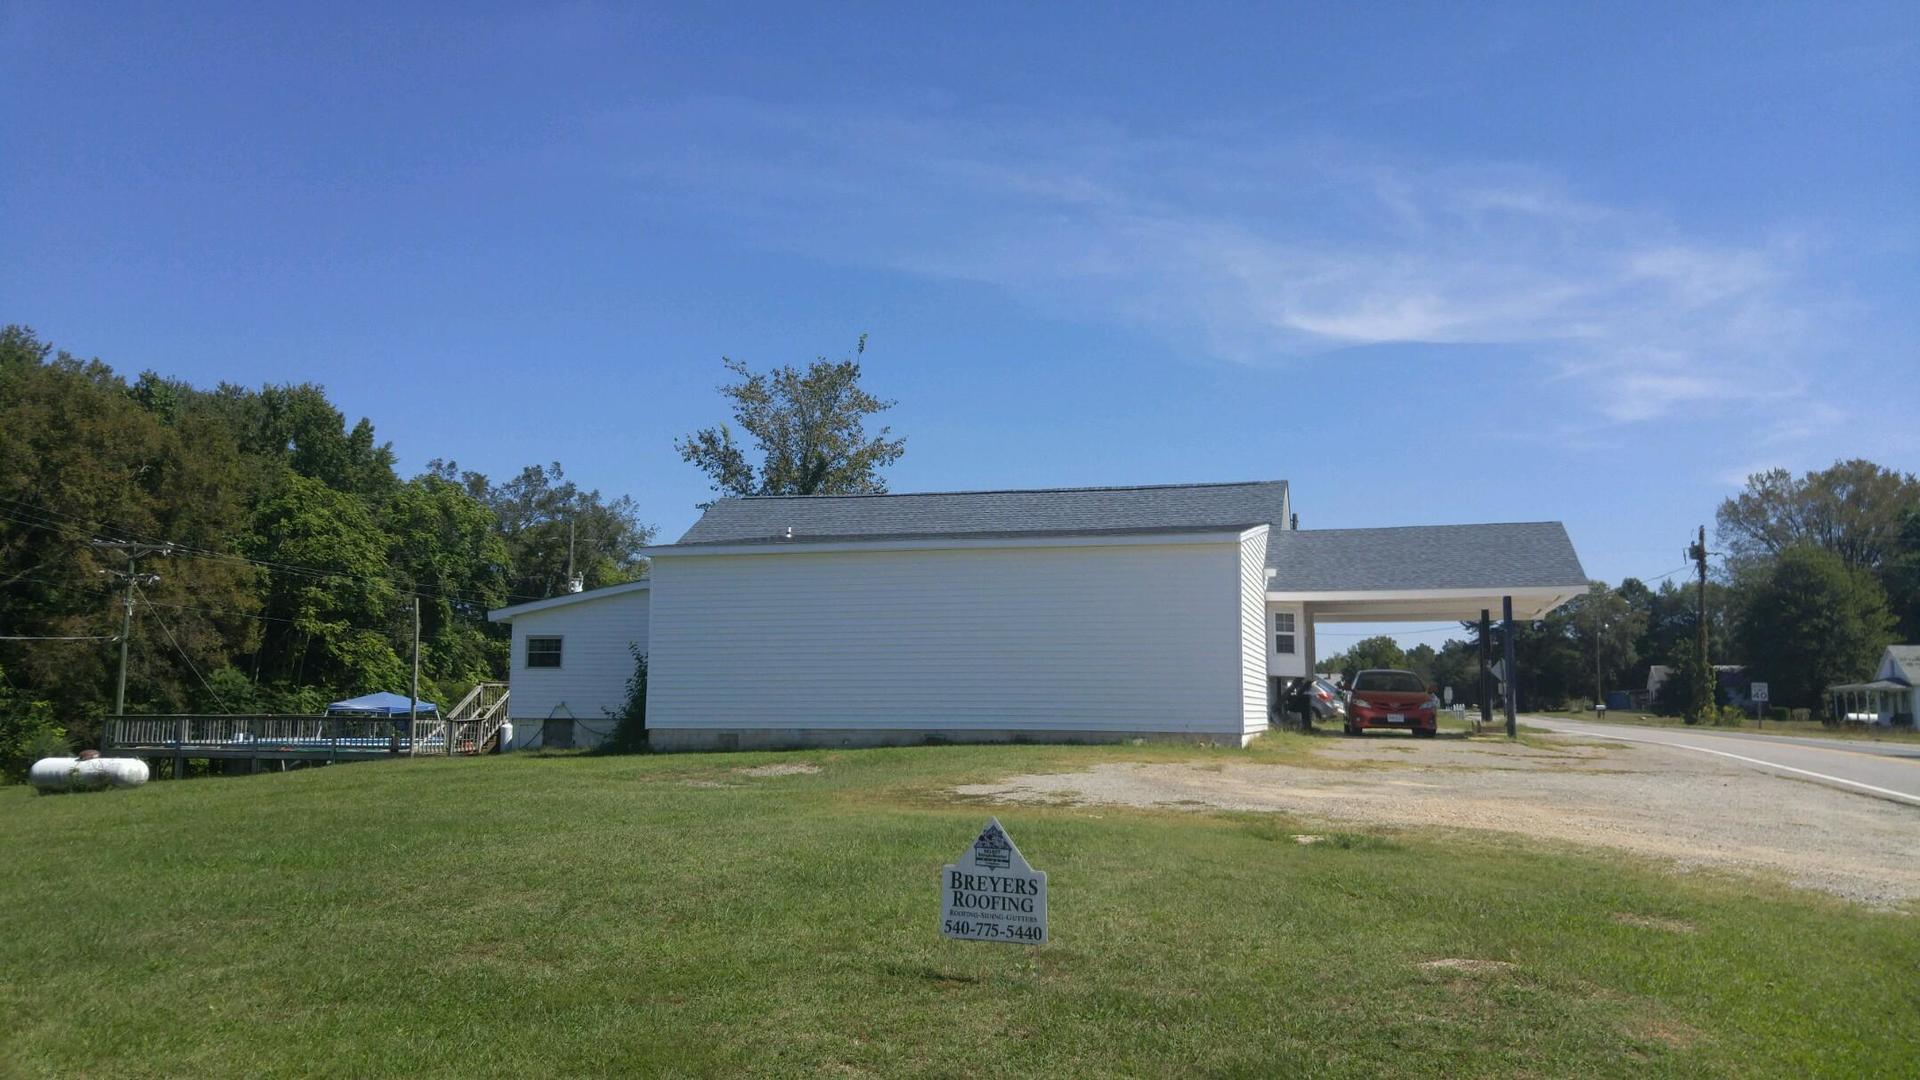 Breyer's Roofing image 2